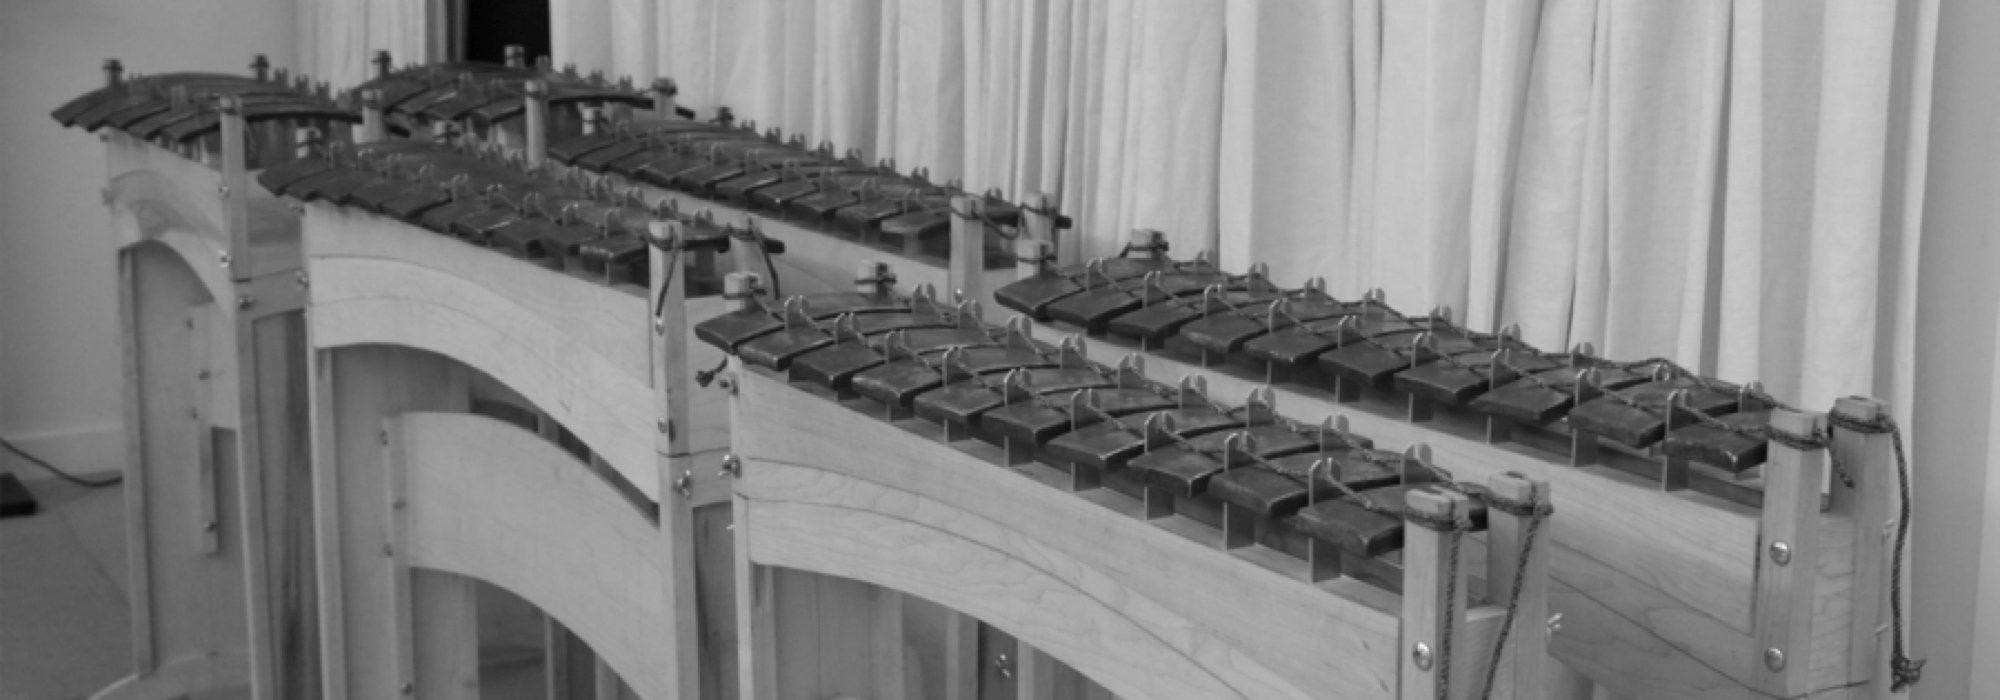 Lightbulb Ensemble instruments